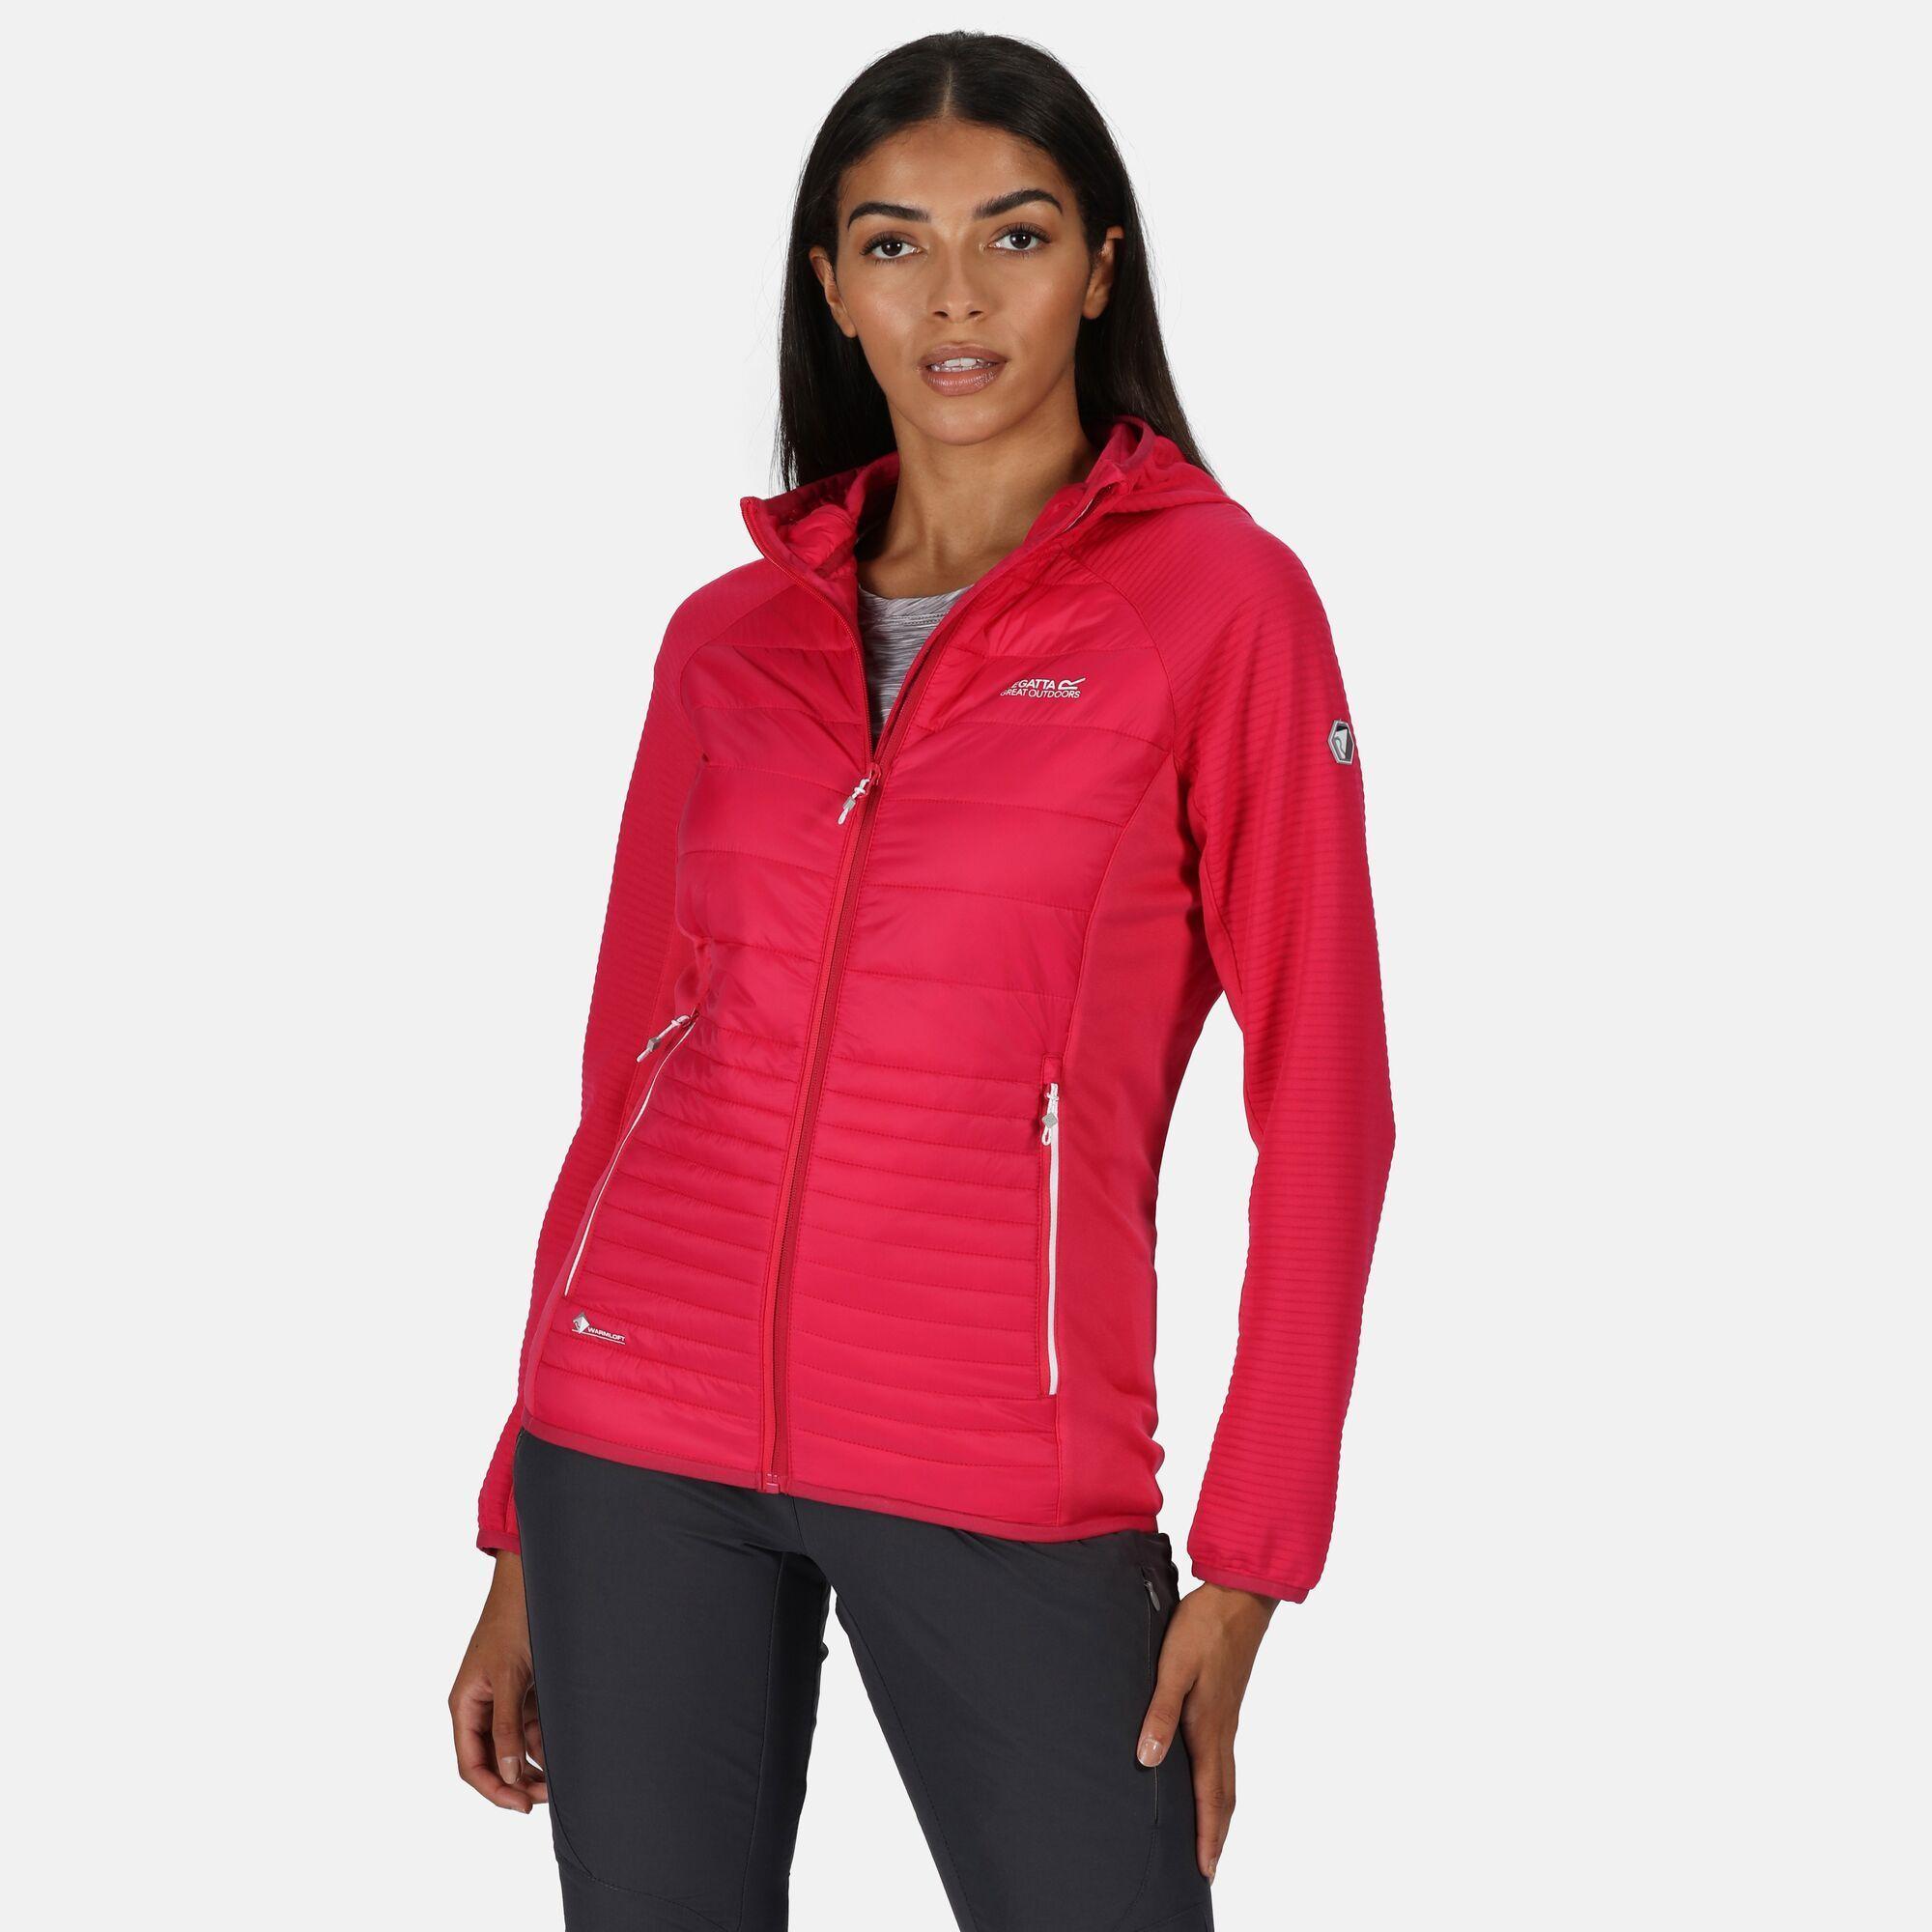 Regatta Womens/Ladies Anderson V Hybrid Walking Jacket (Duchess Pink)